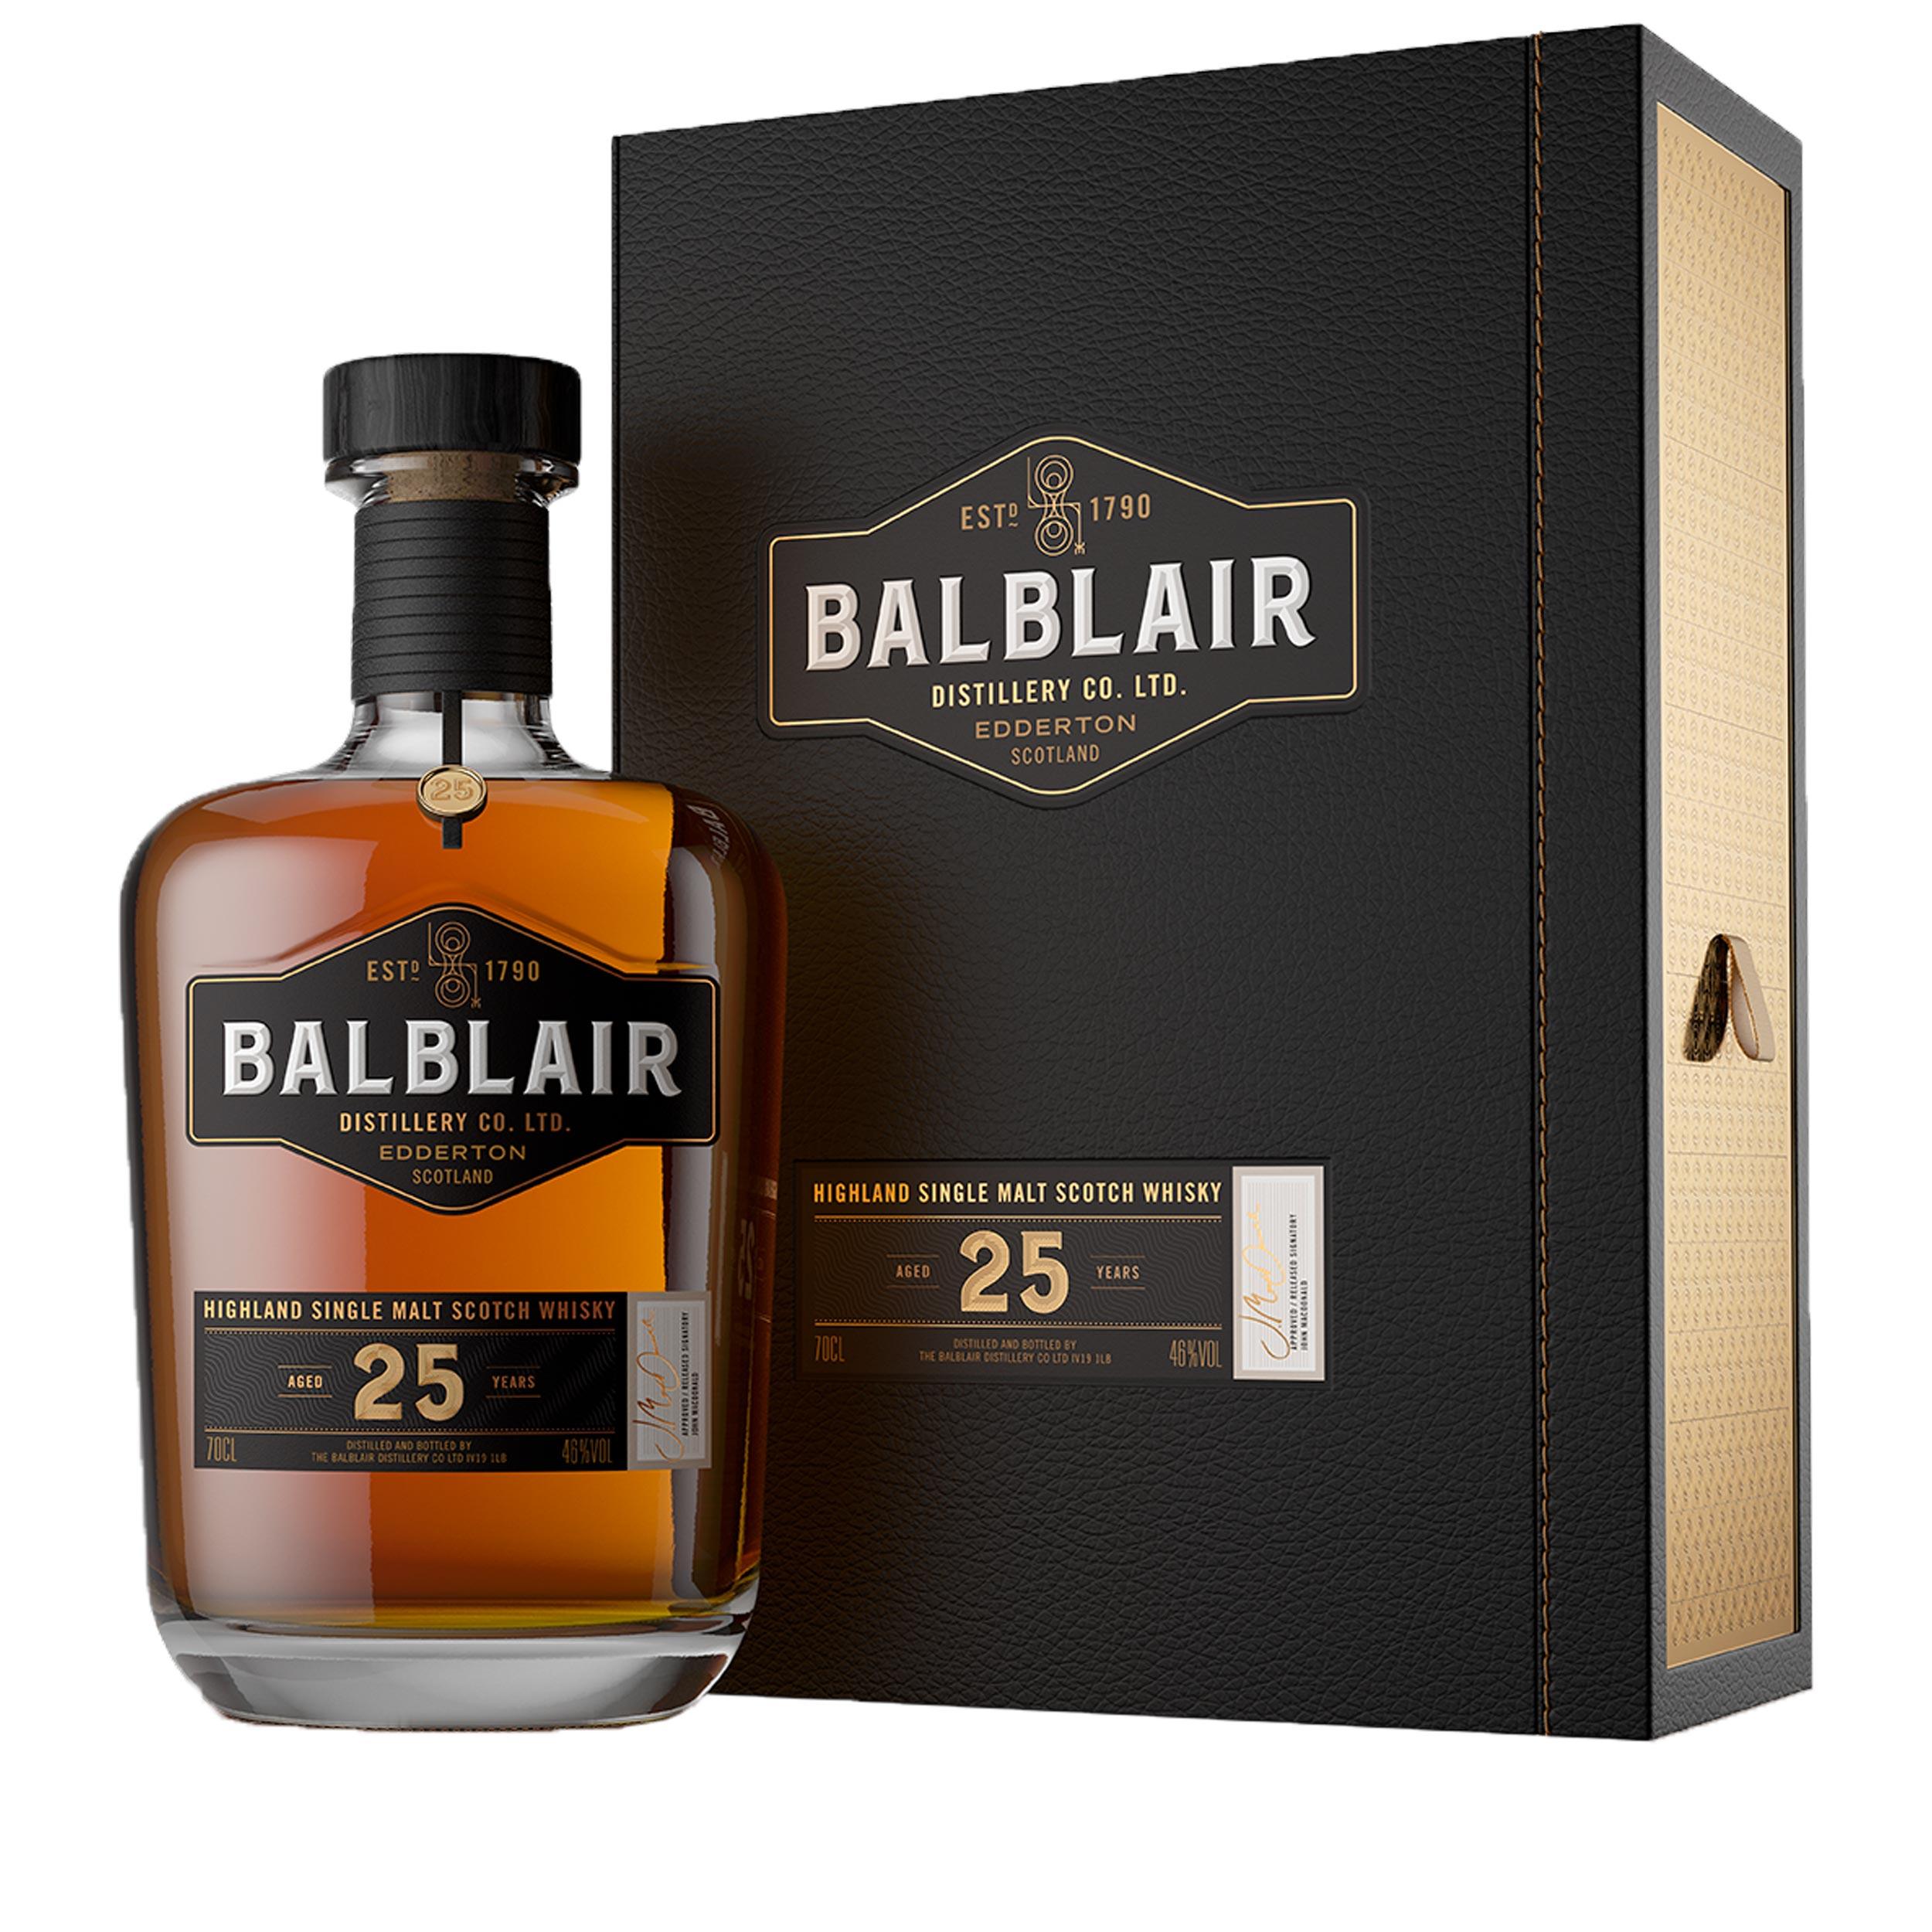 Balblair 25 Year Old Highland Single Malt Scotch Whisky 70cl